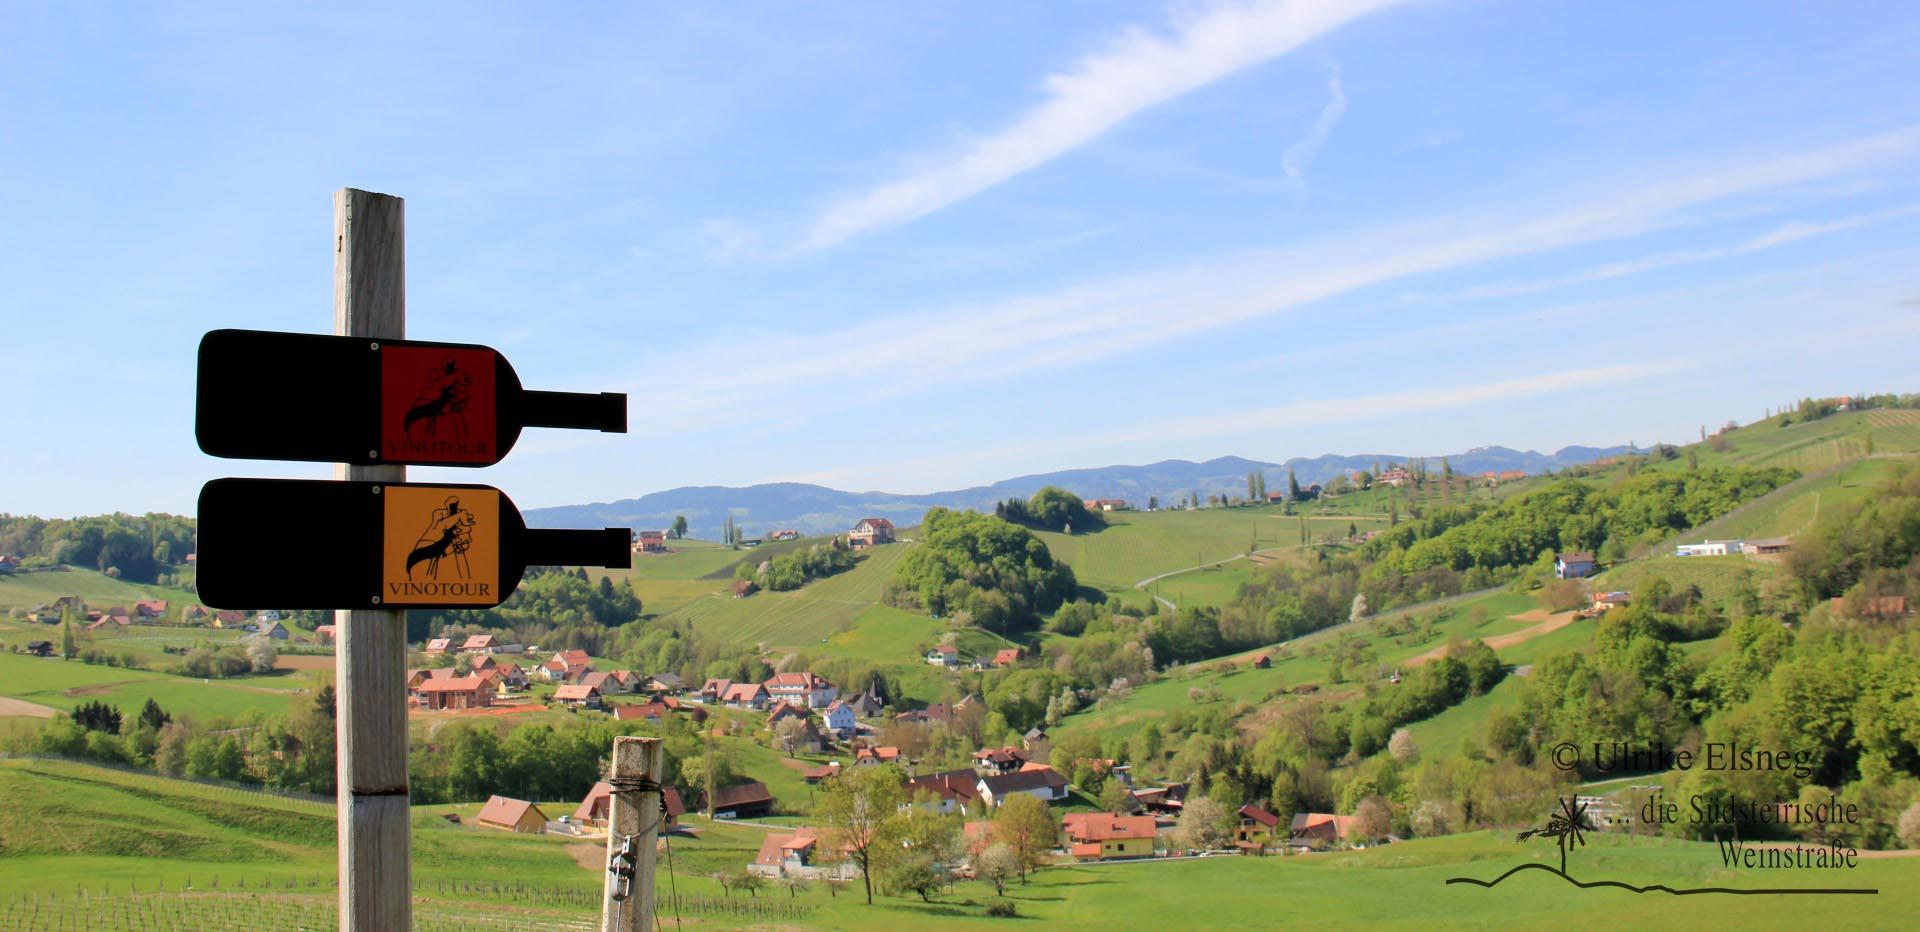 Vinotour Ratsch - Svecina (Foto: Ulrike Elsneg)